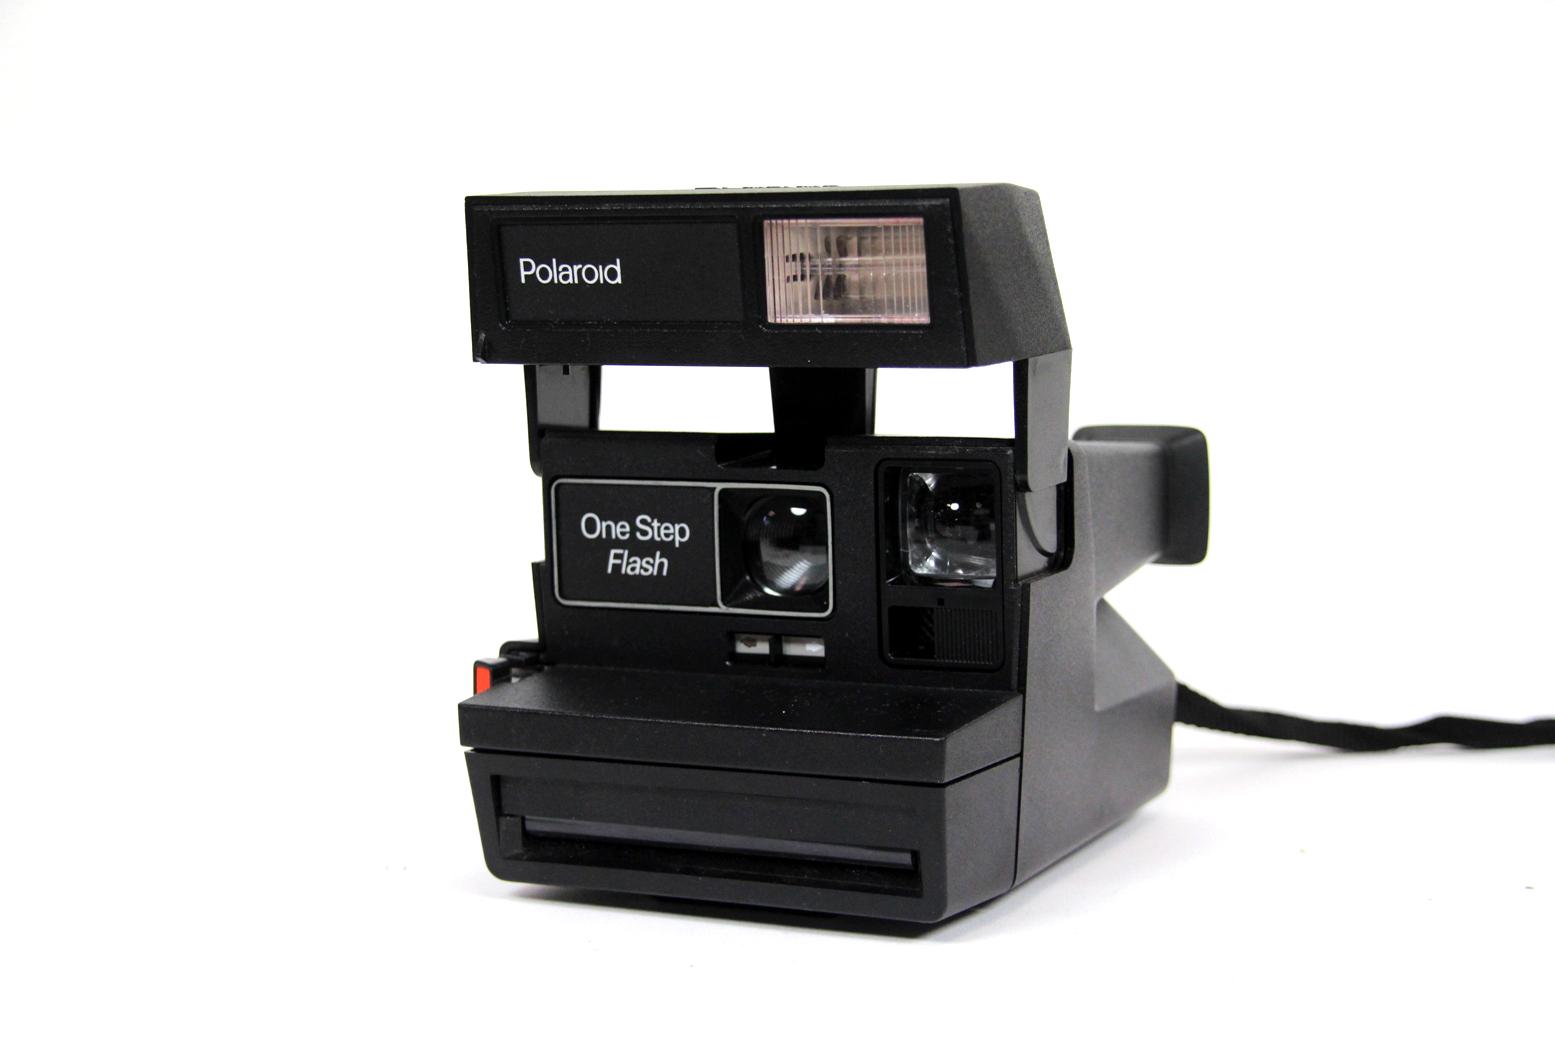 polaroid one step flash sofortbildkamera retro instant camera sofortbild kamera ebay. Black Bedroom Furniture Sets. Home Design Ideas